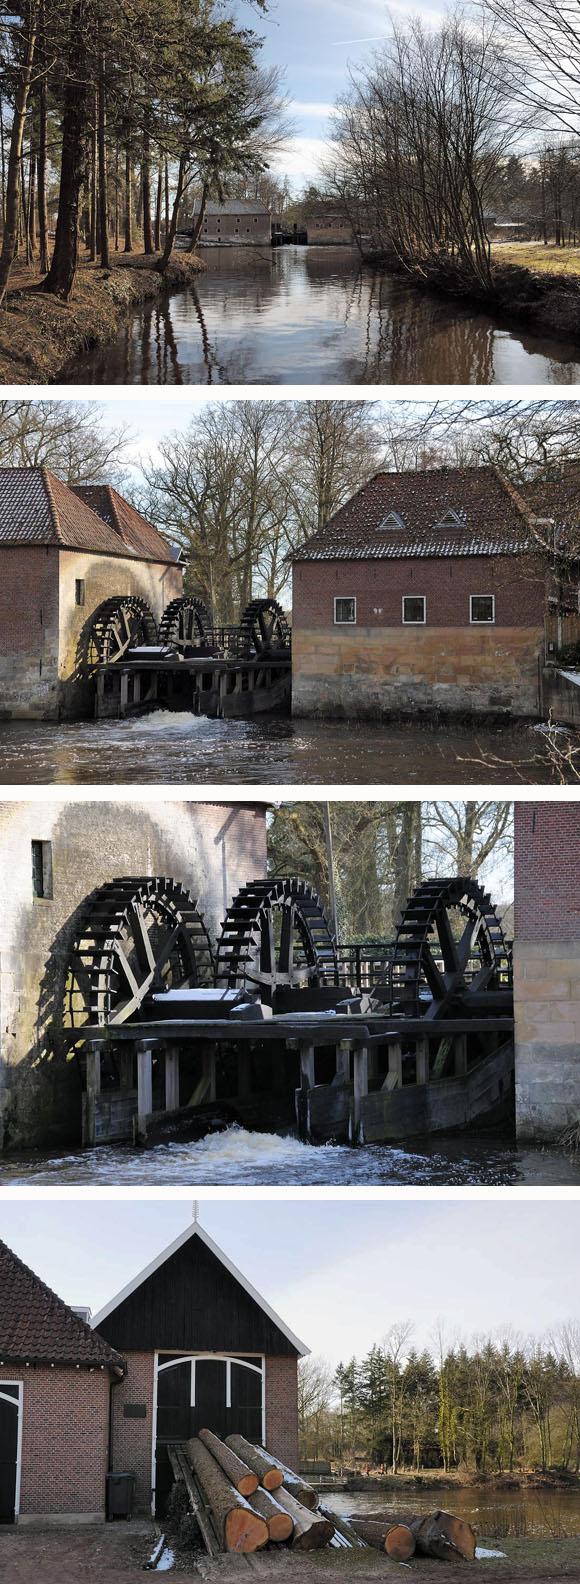 Watermolen van Singraven, Denekamp, Eddy Blenke (07-03-2010) | Database Nederlandse molens